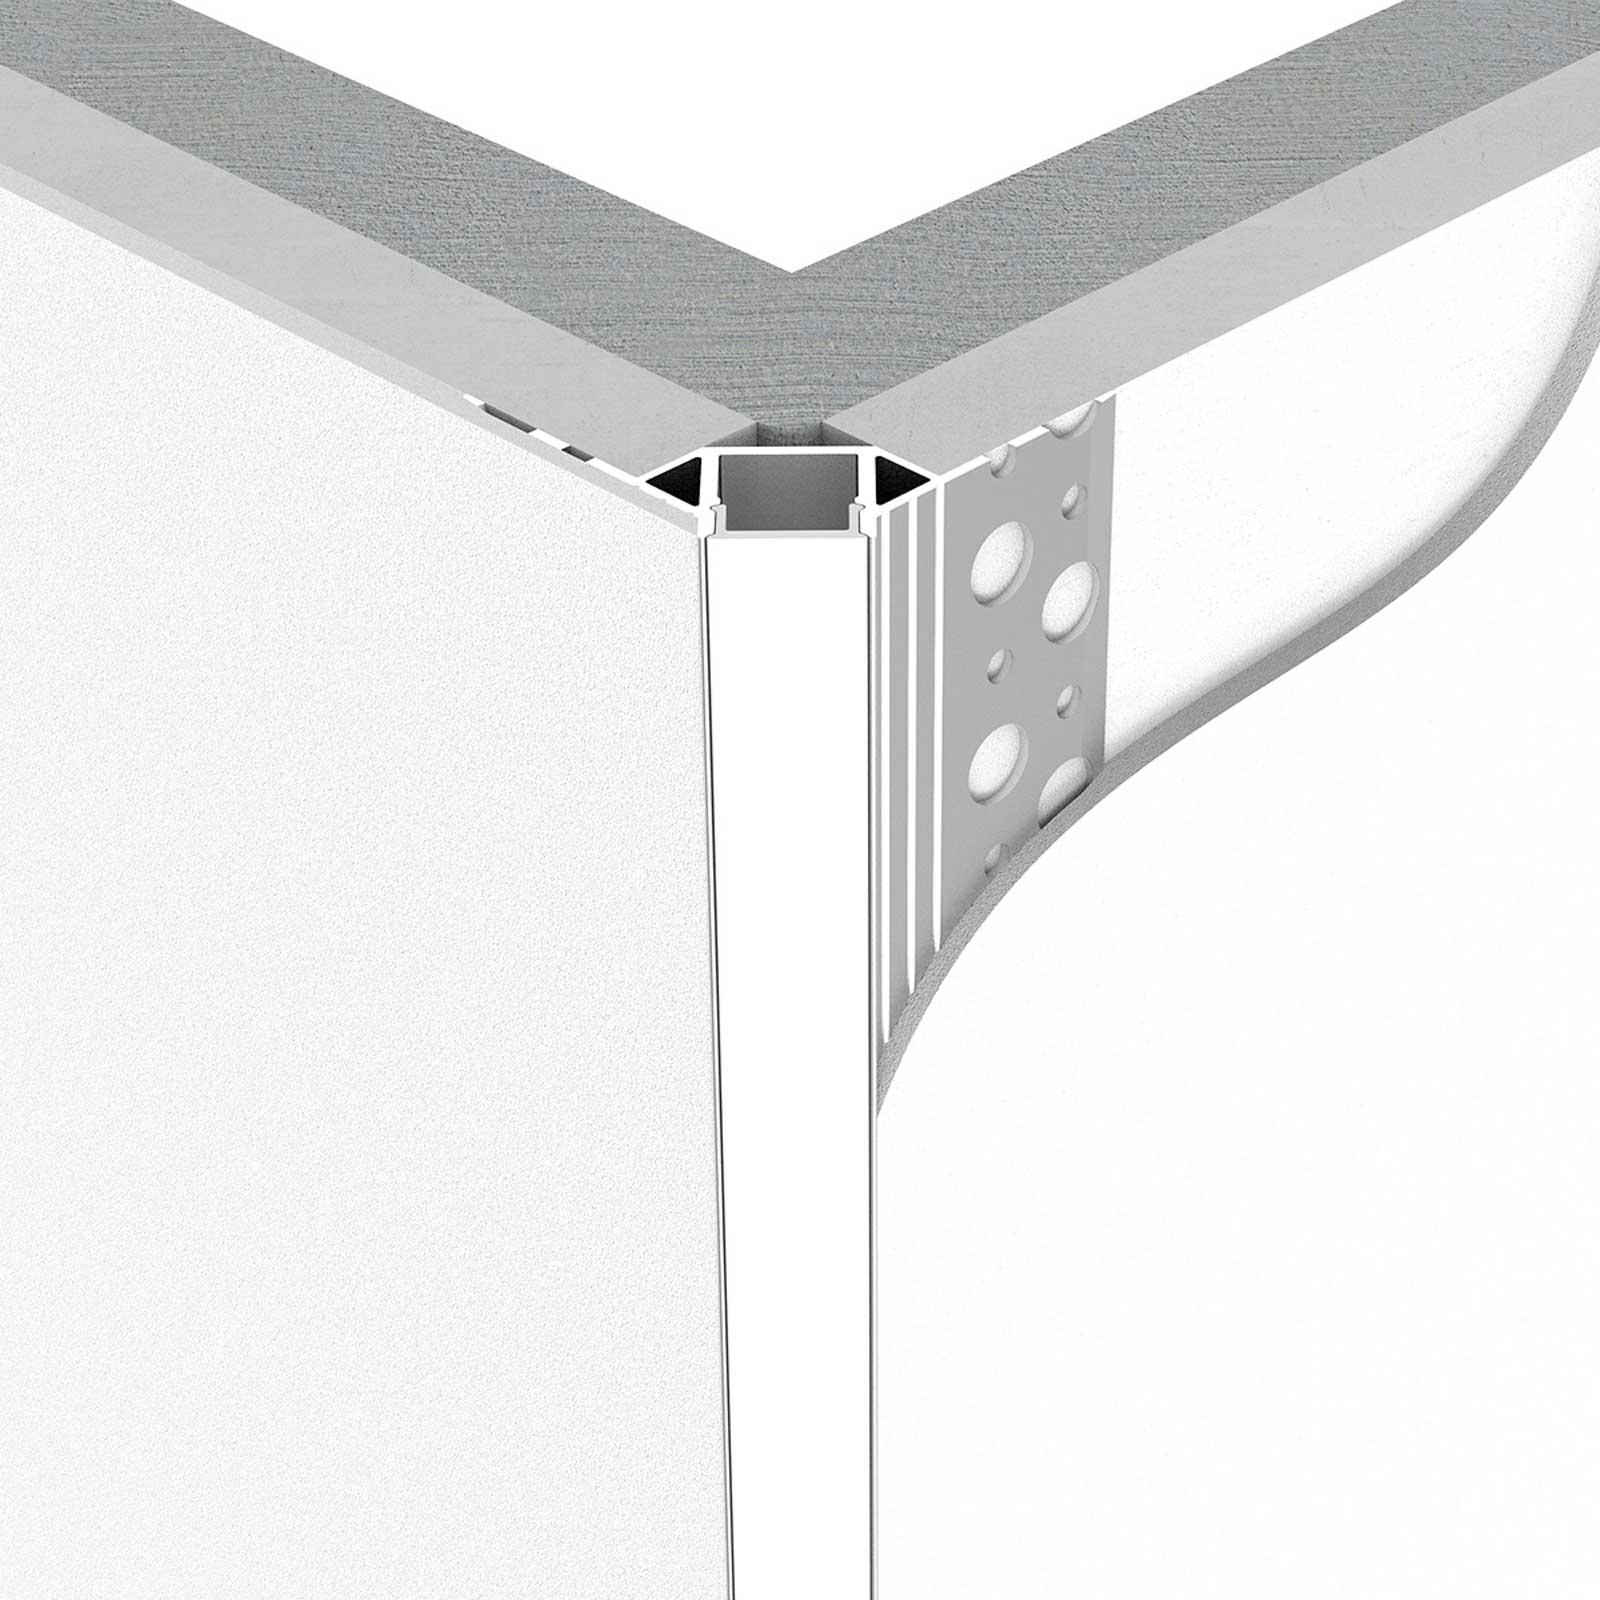 Montage 2 Meter LED Außeneck-Aluprofil GIPA (GP) für Trockenbau Rigipswand